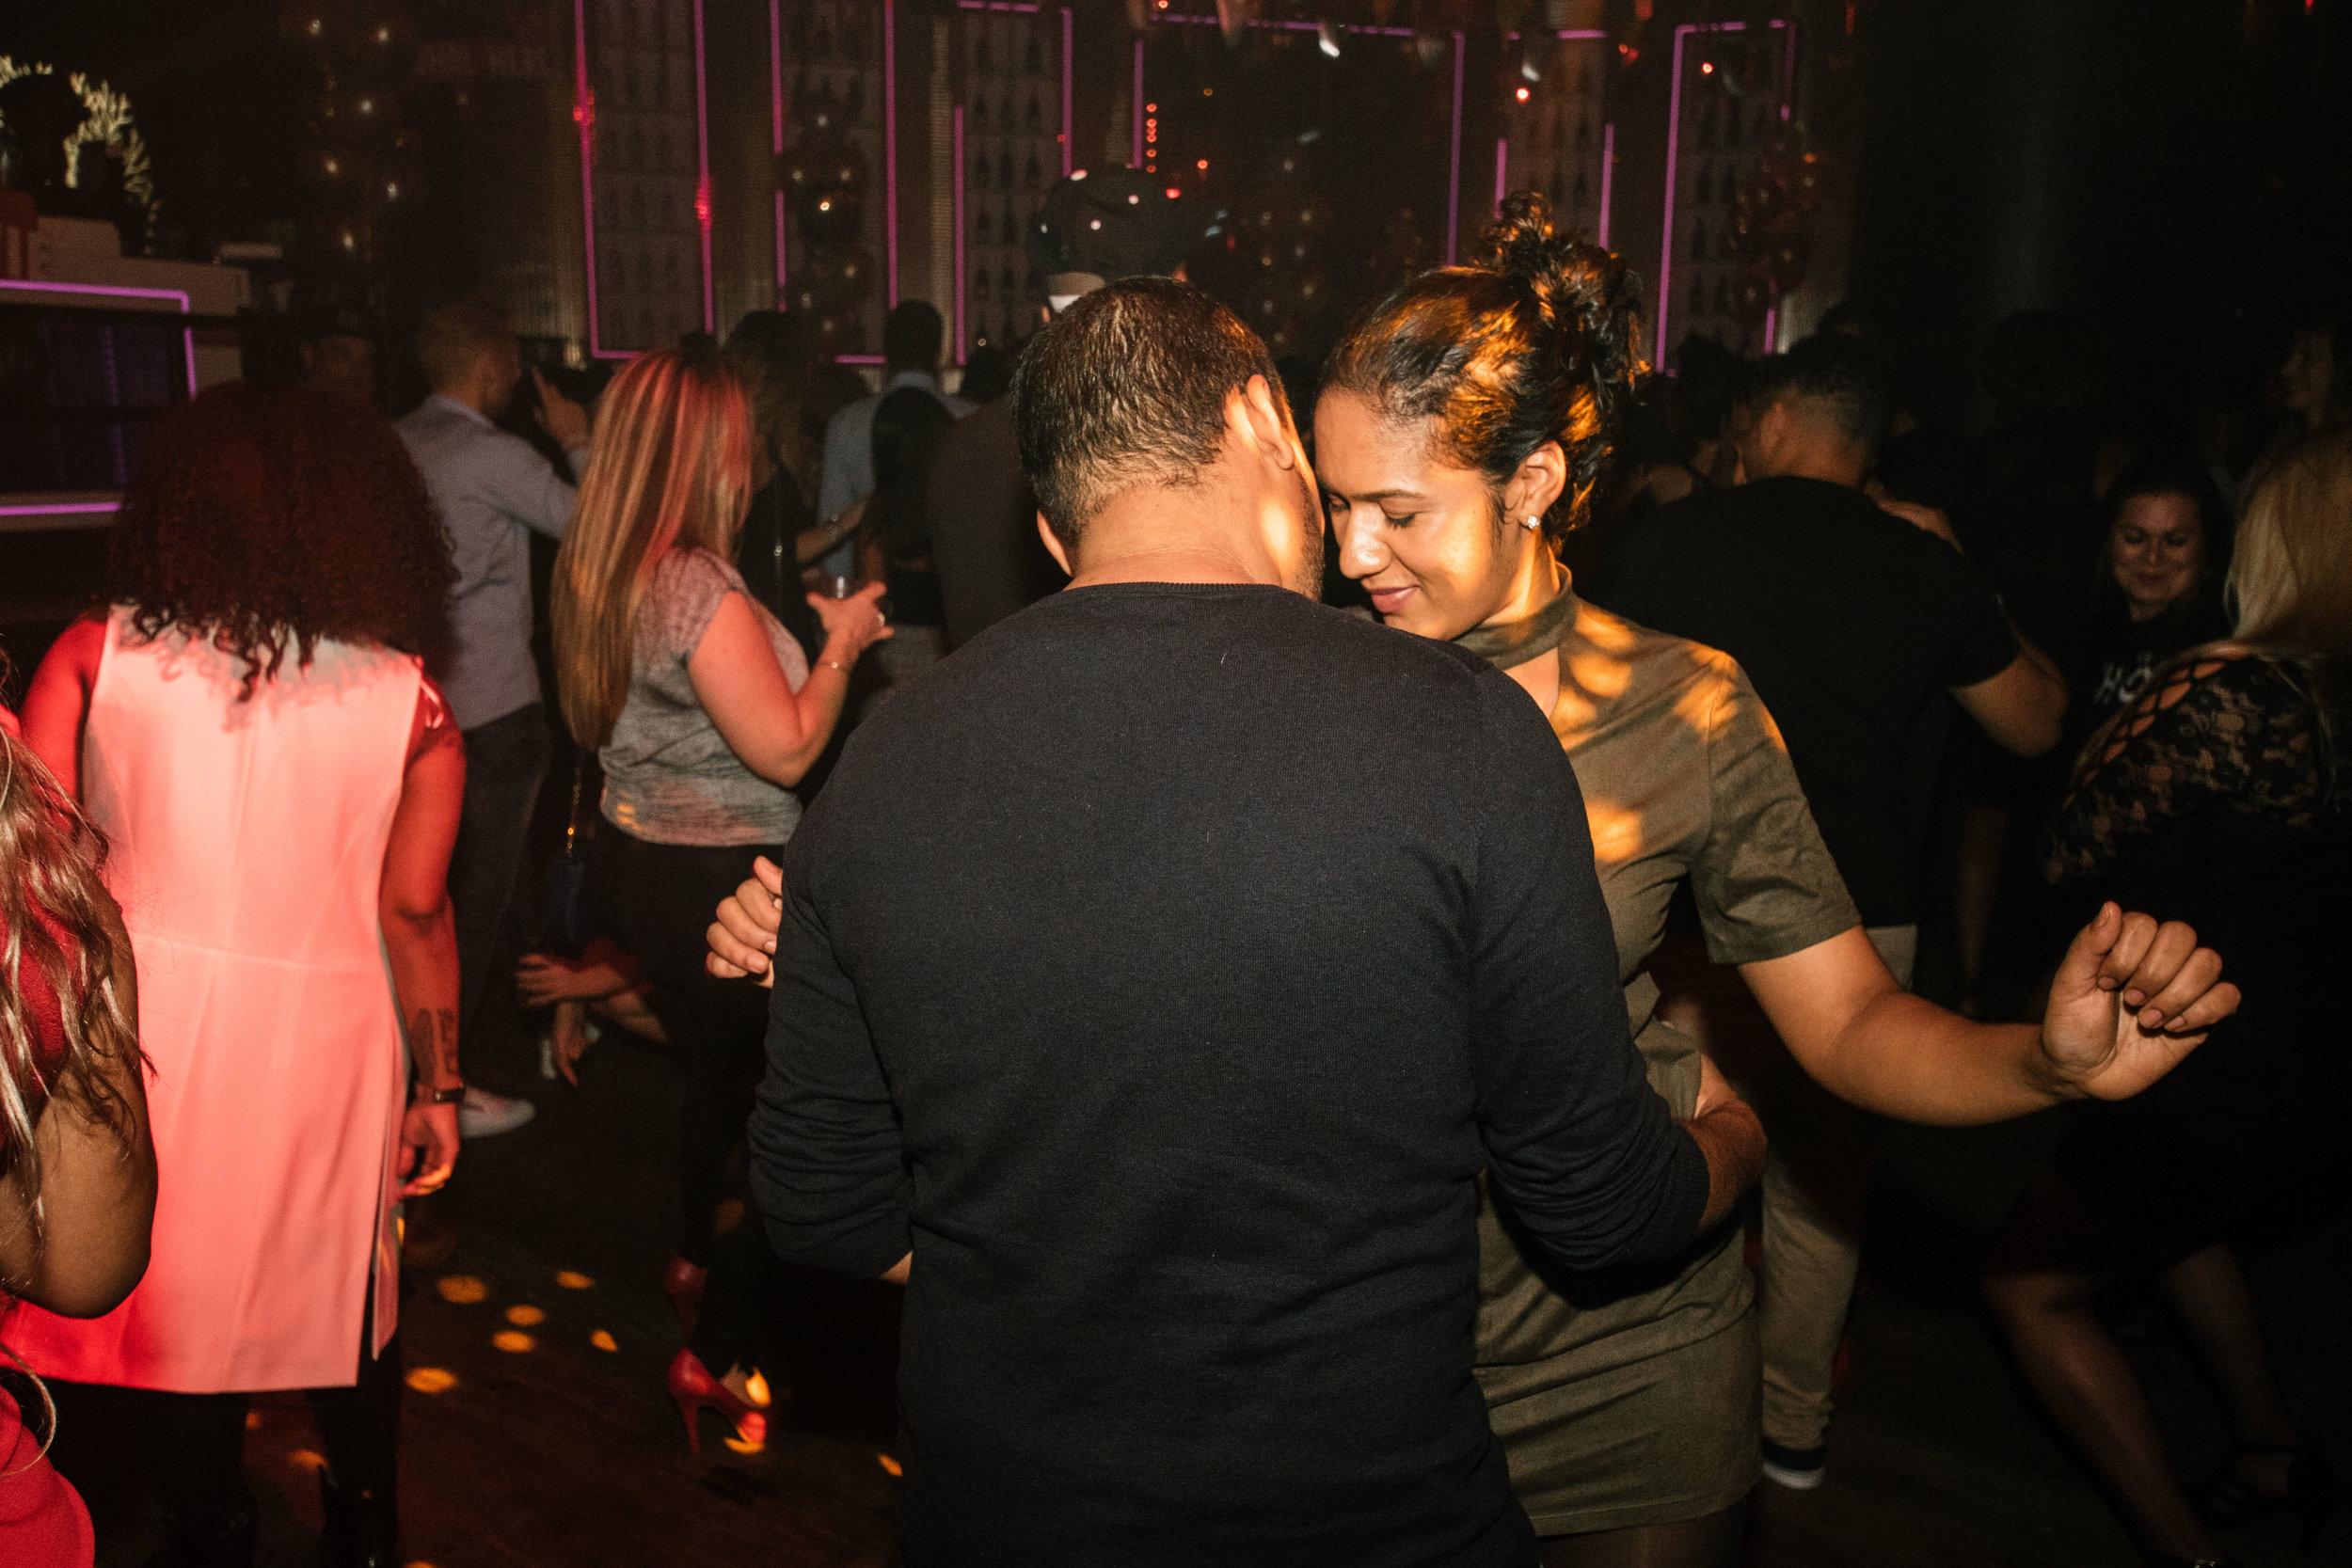 Club_Vie-4.jpg